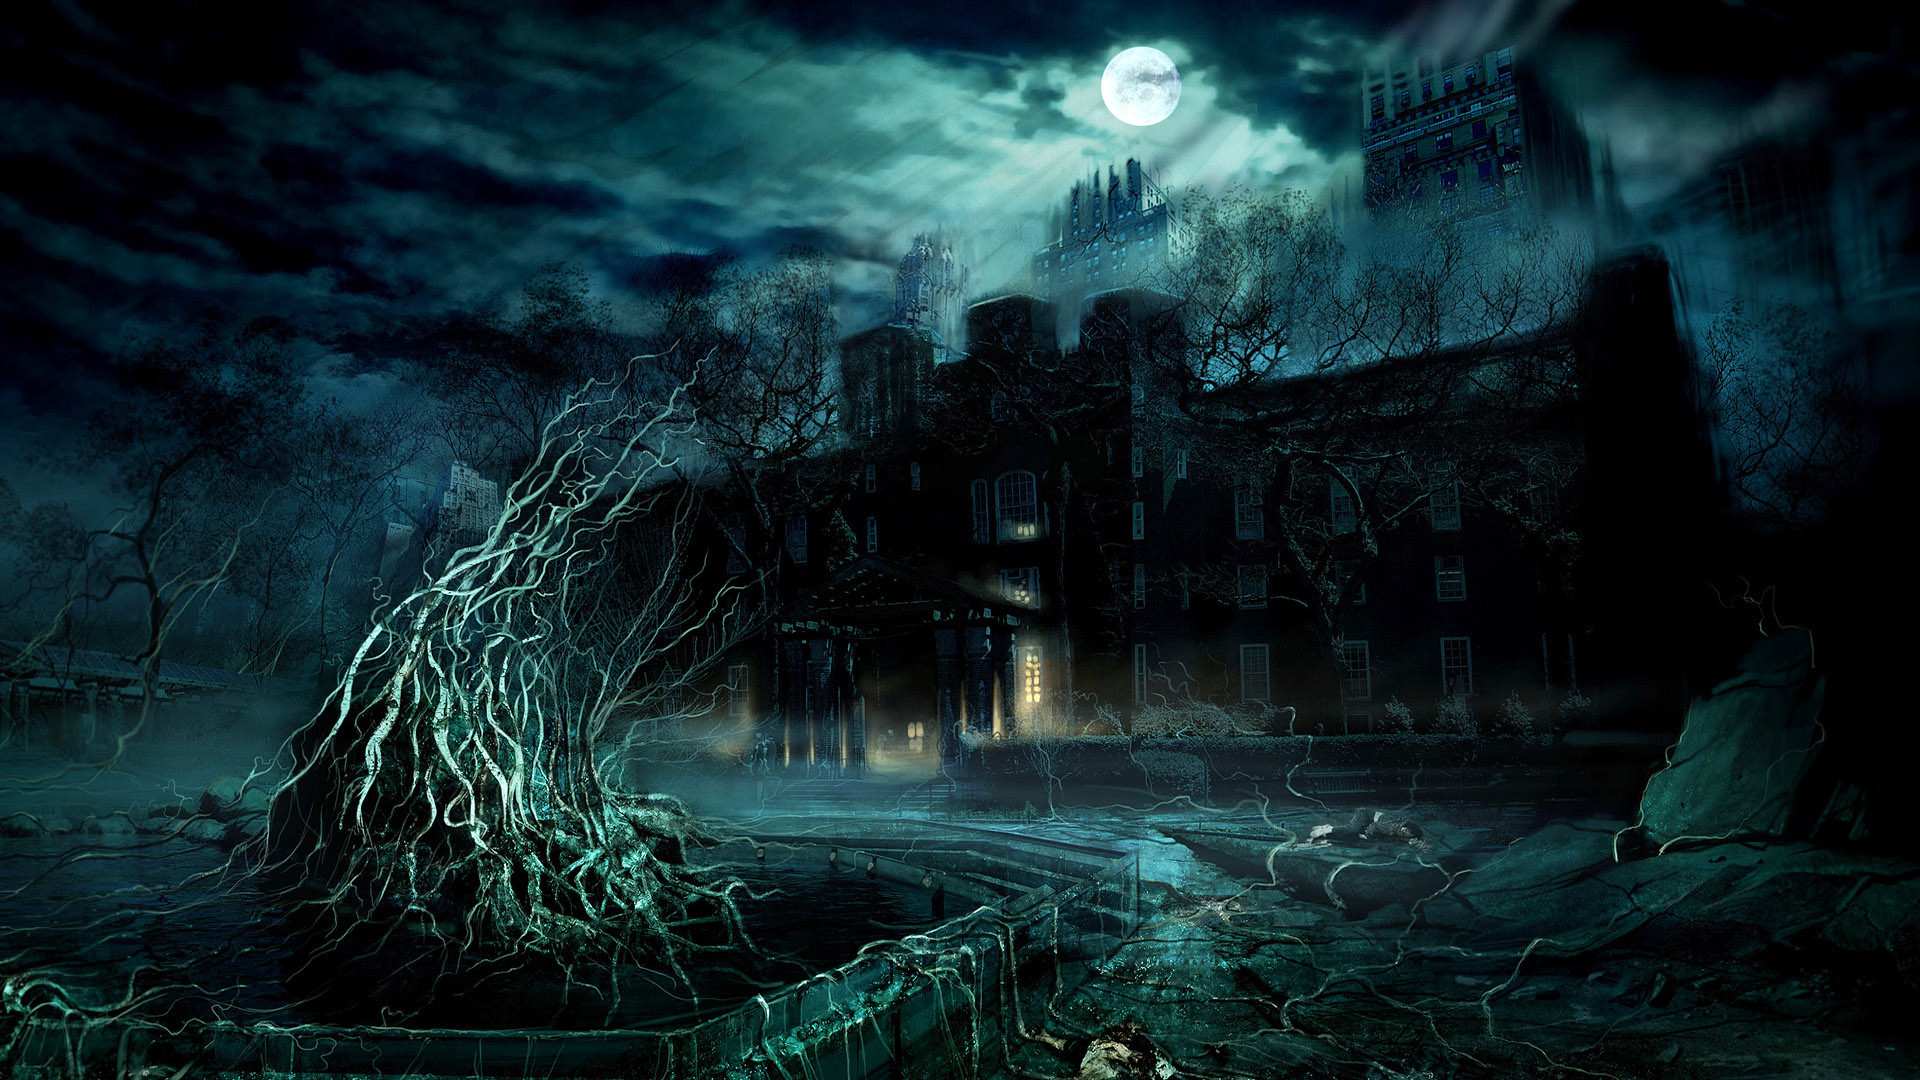 Dark Night Fantasy Places HD Wallpaper – https://www.cartoonography.com